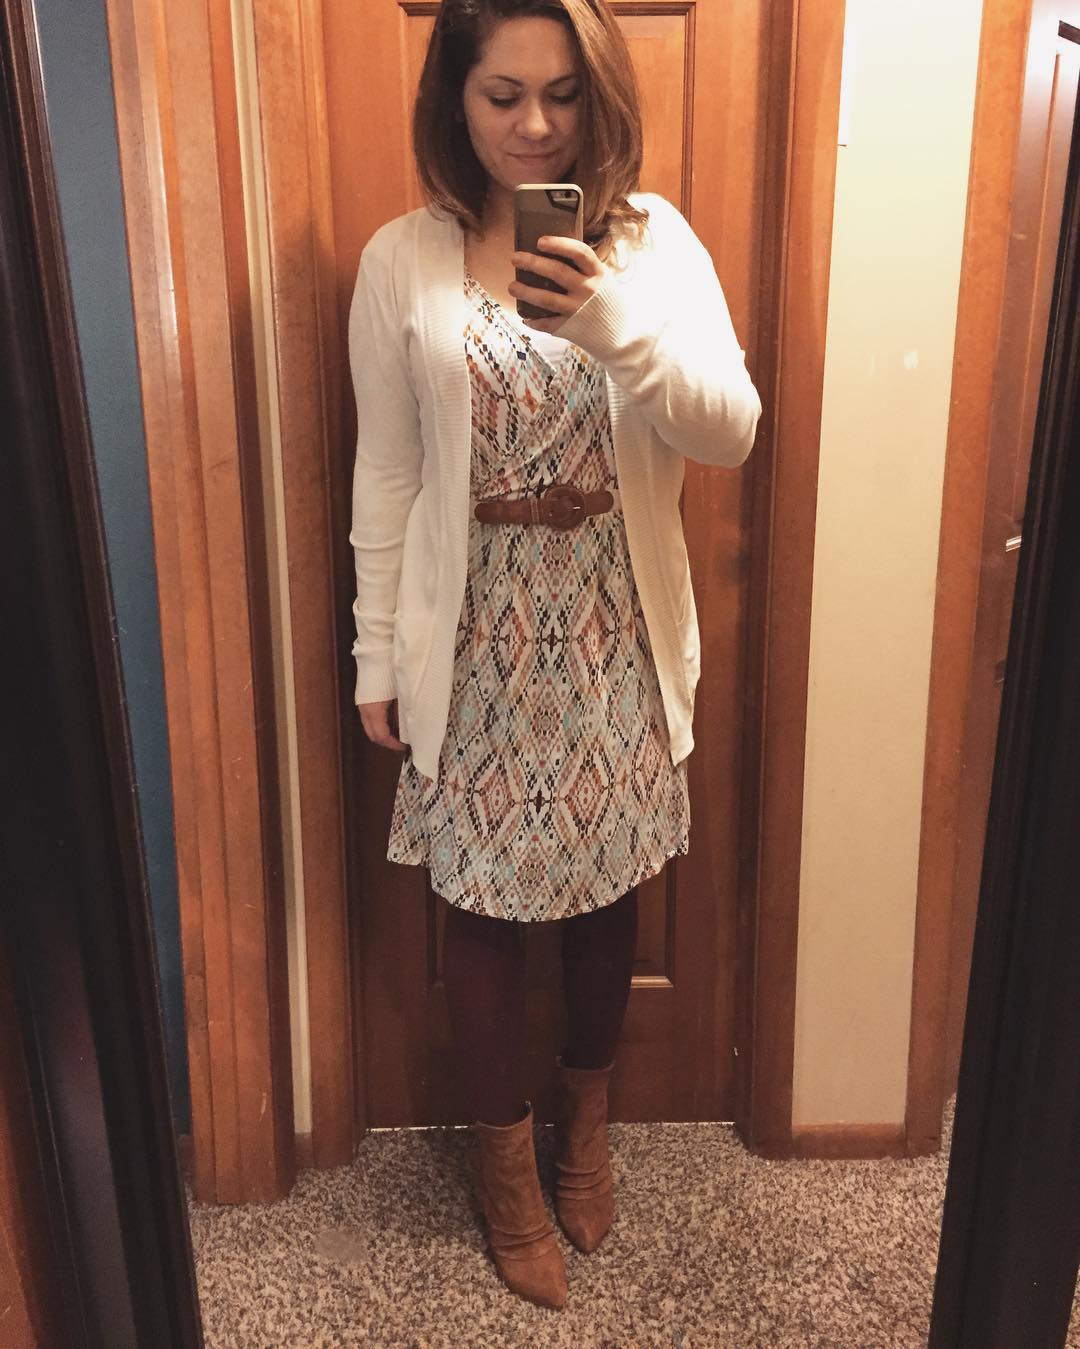 Fall Style: Stitch Fix Market & Spruce O'Hara Wrap Dress + Ivory Cardi